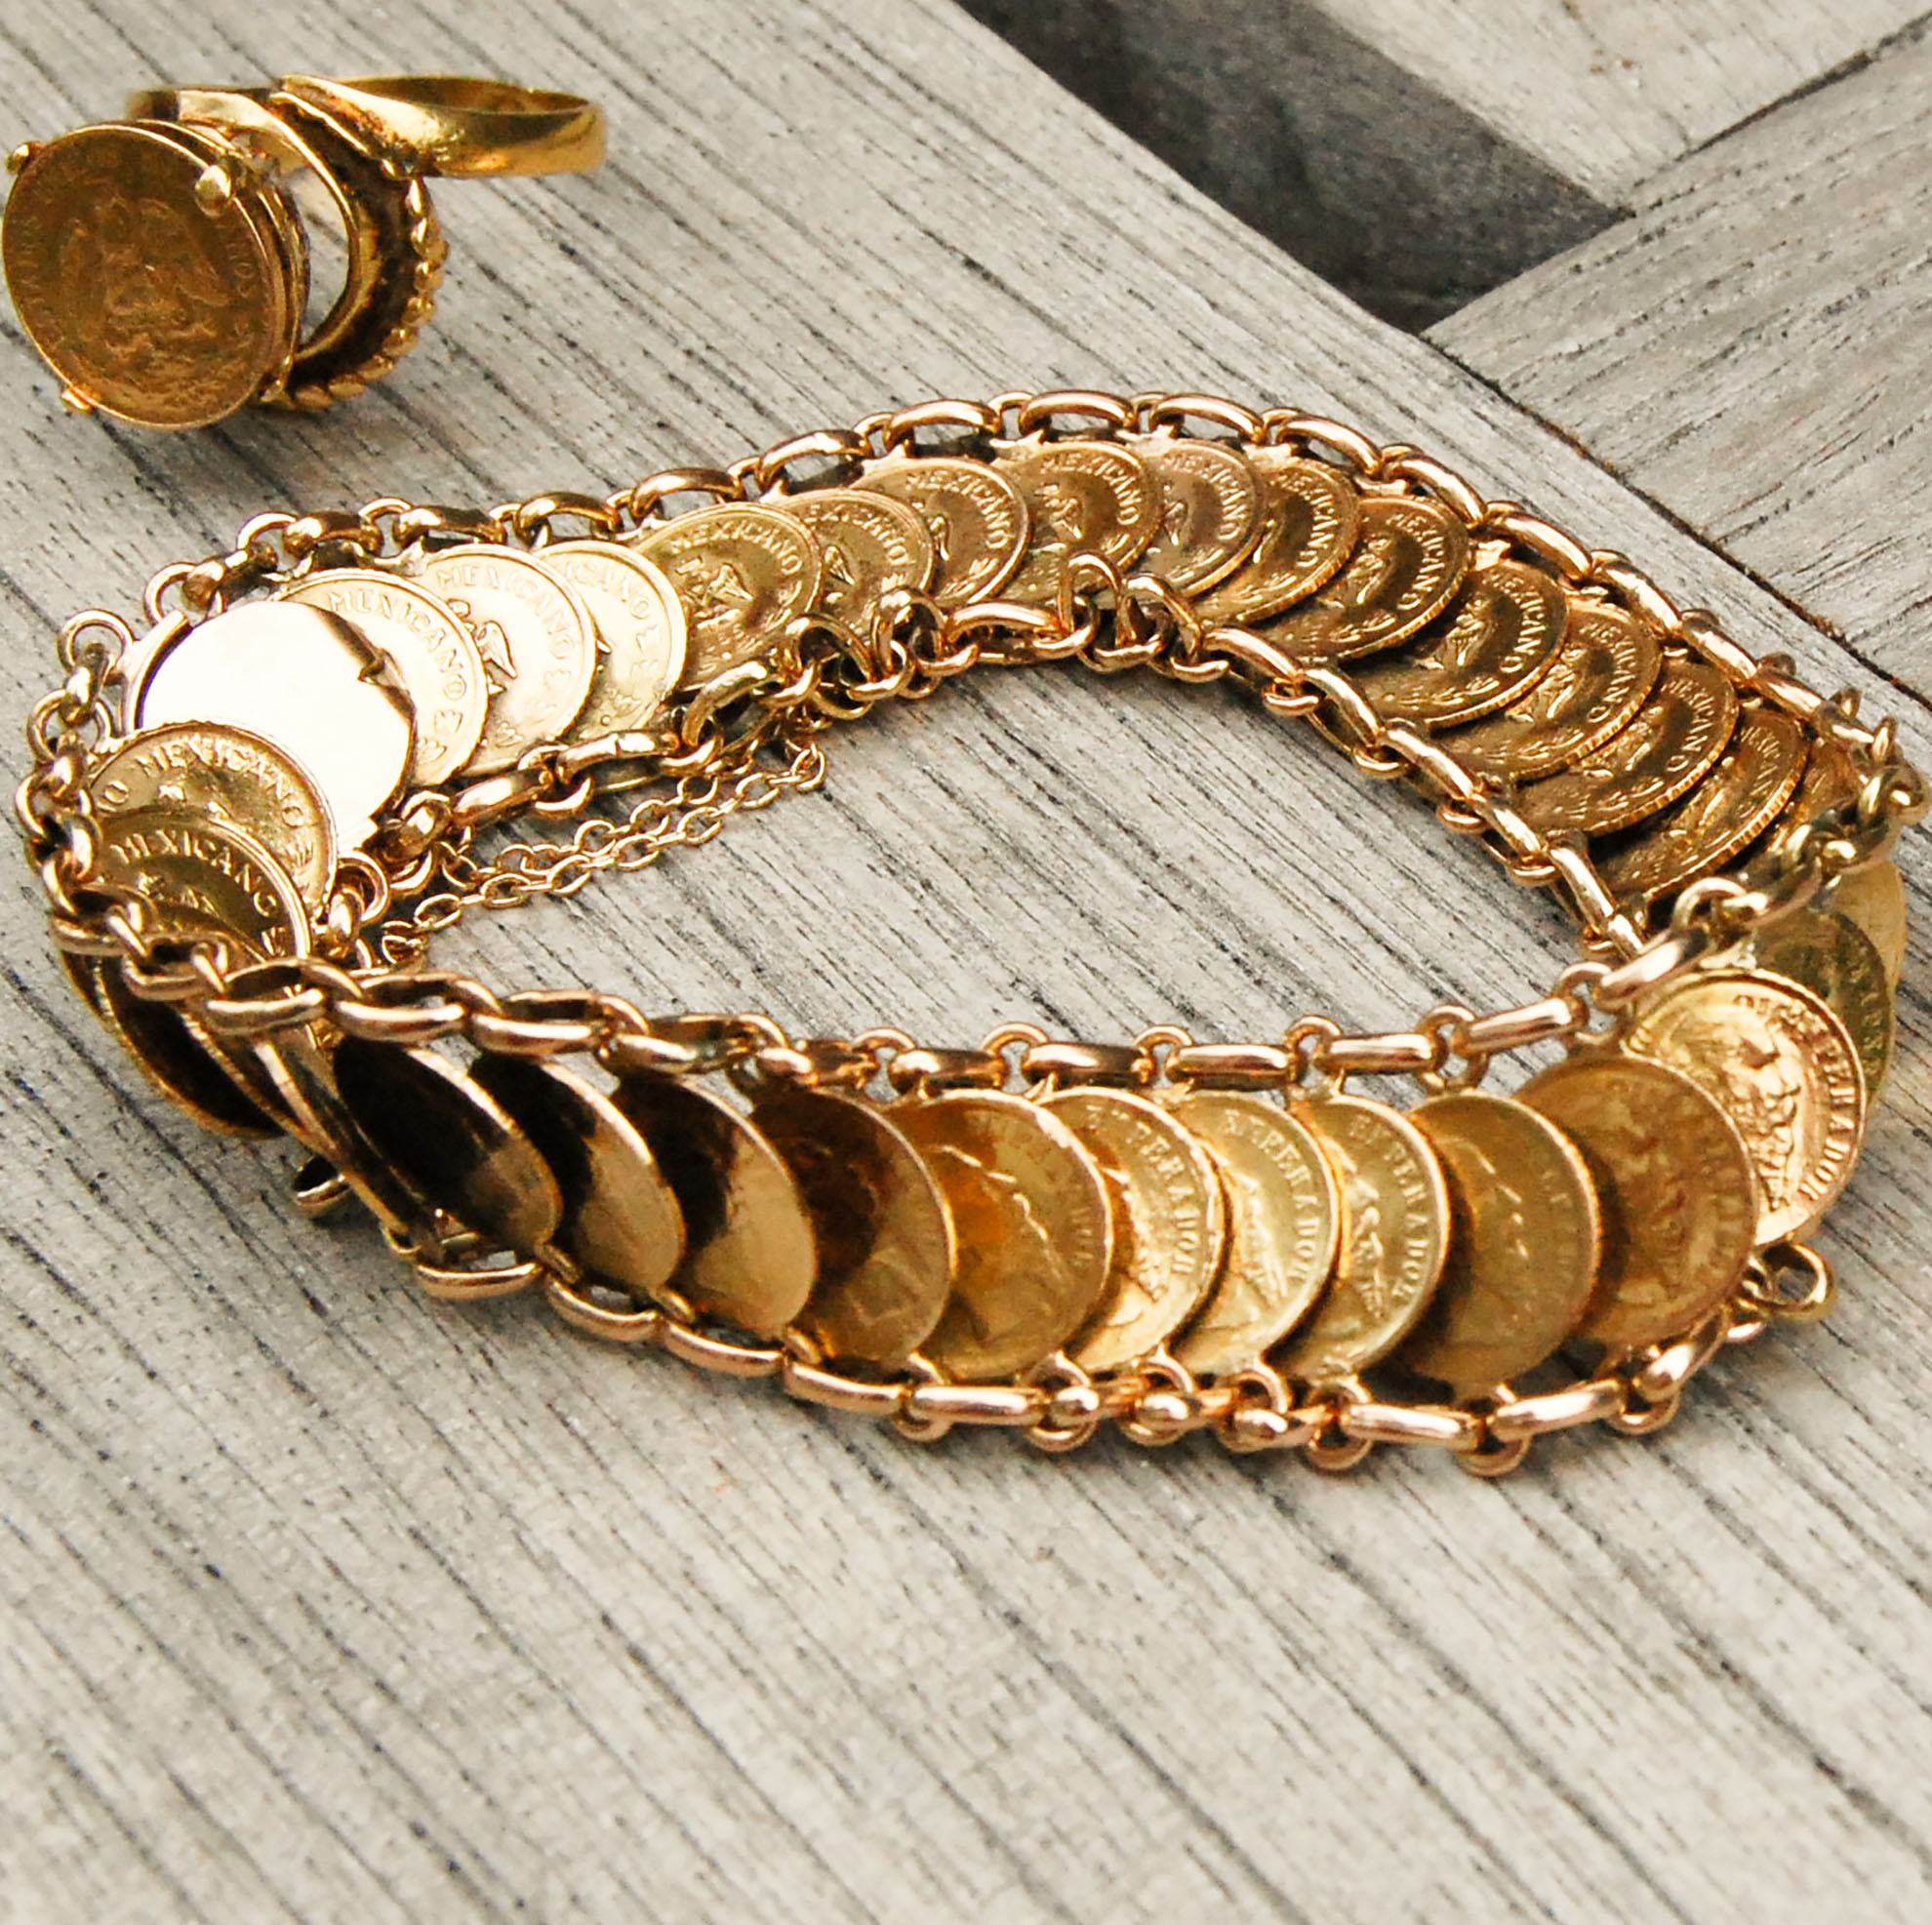 Dos Pesos 24k Gold Coin Bracelet